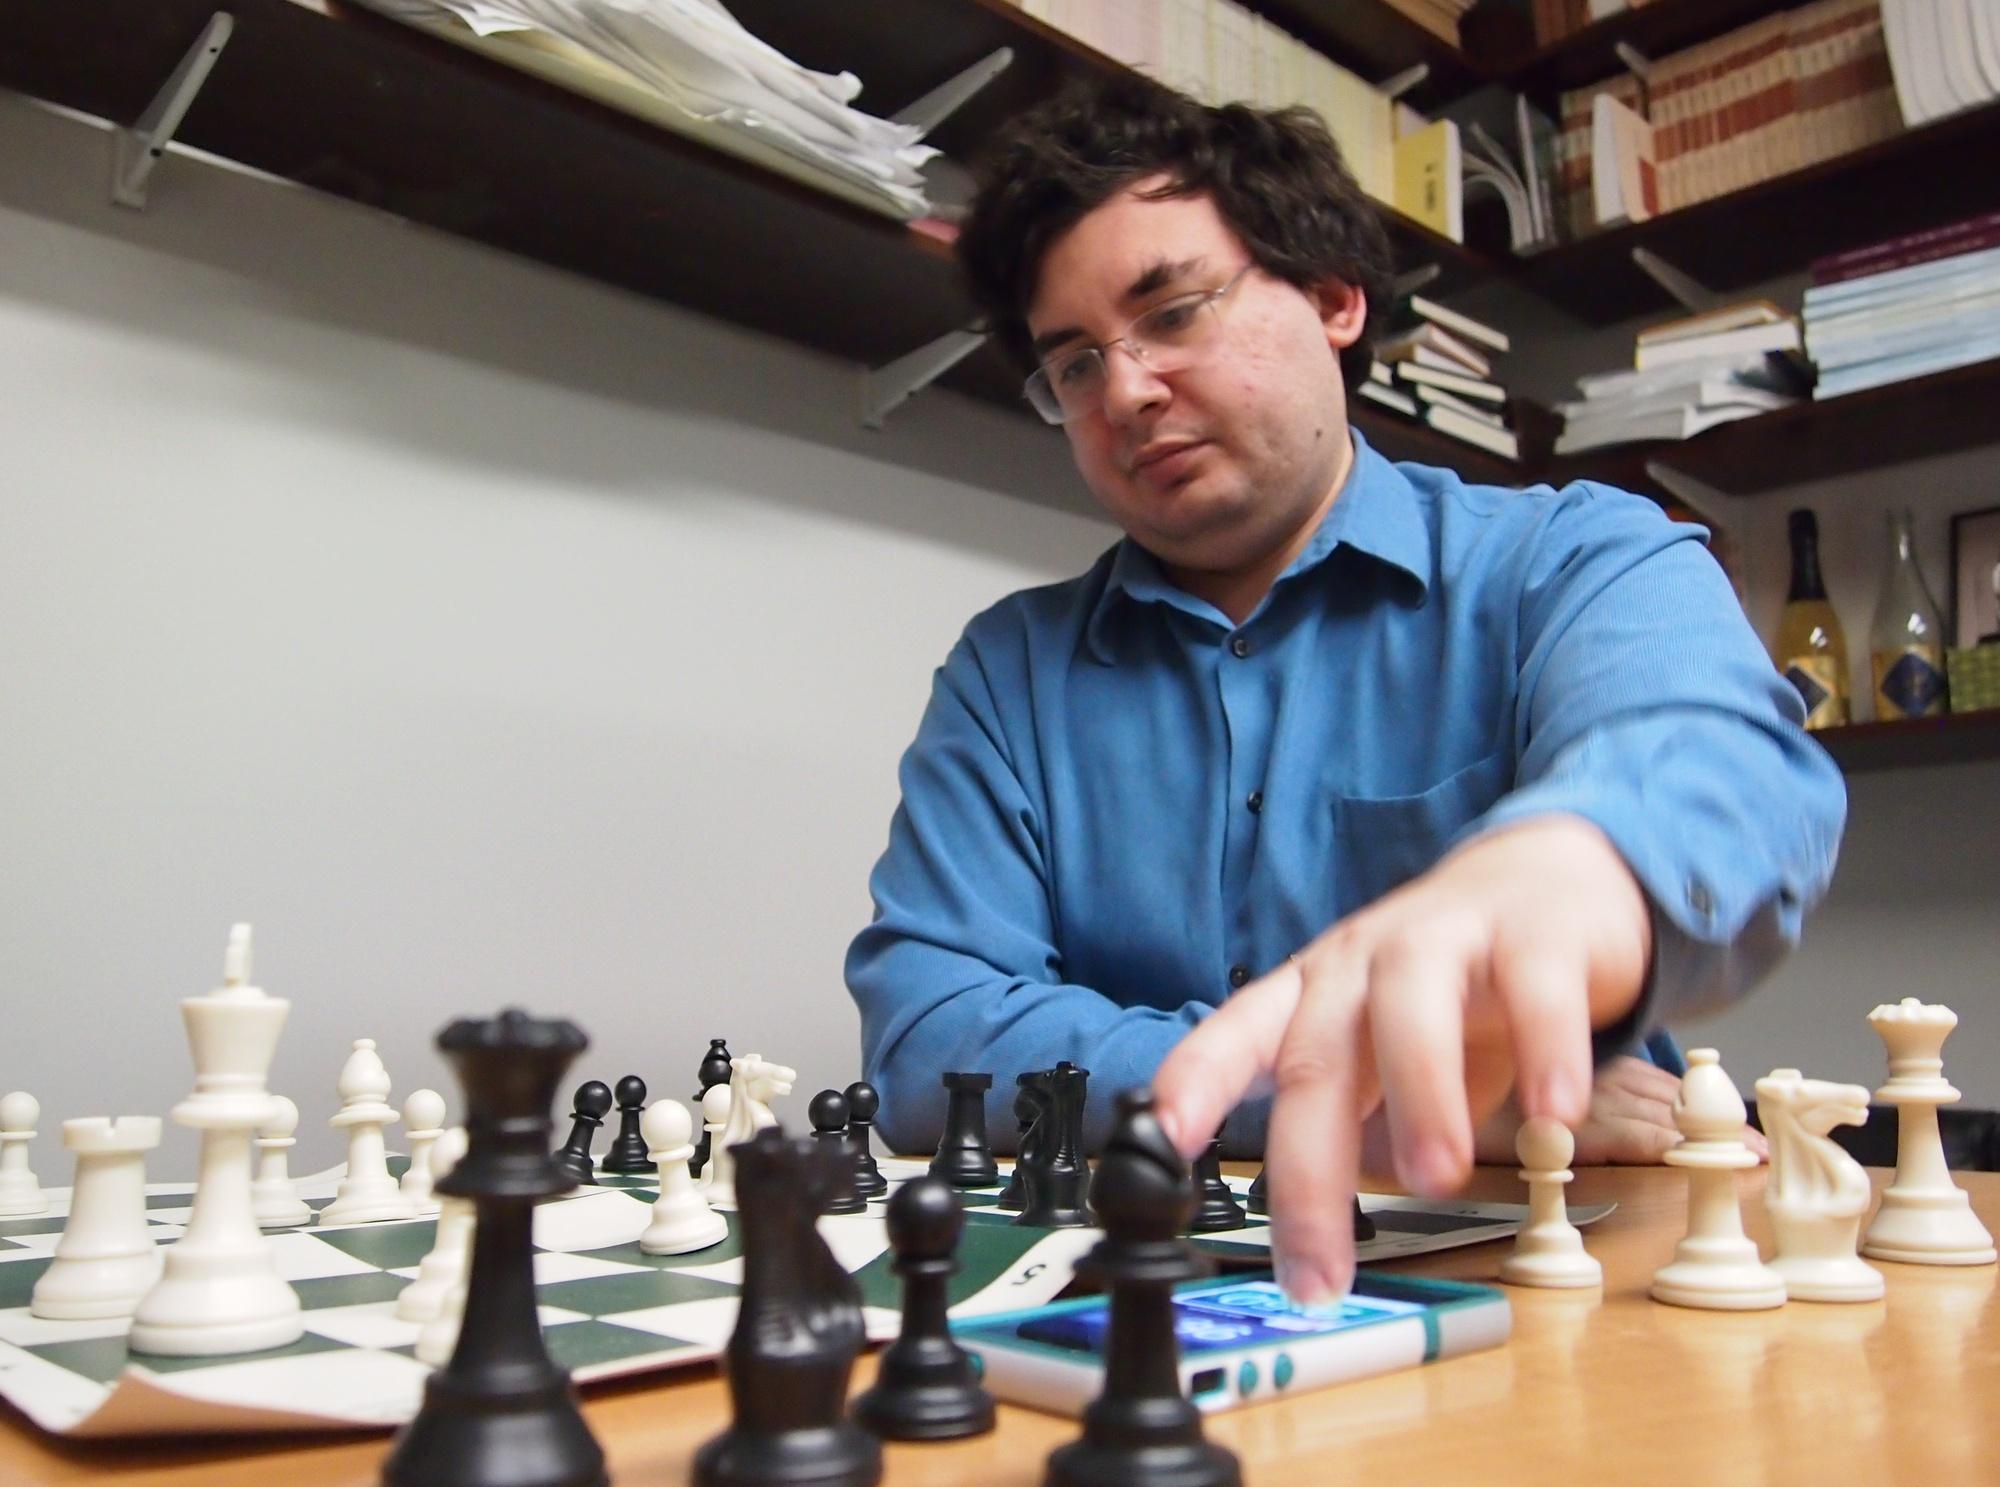 Harvard professor Joseph K. Blitzstein makes a move in a chess game against fellow Harvard professor Noam Elkies.